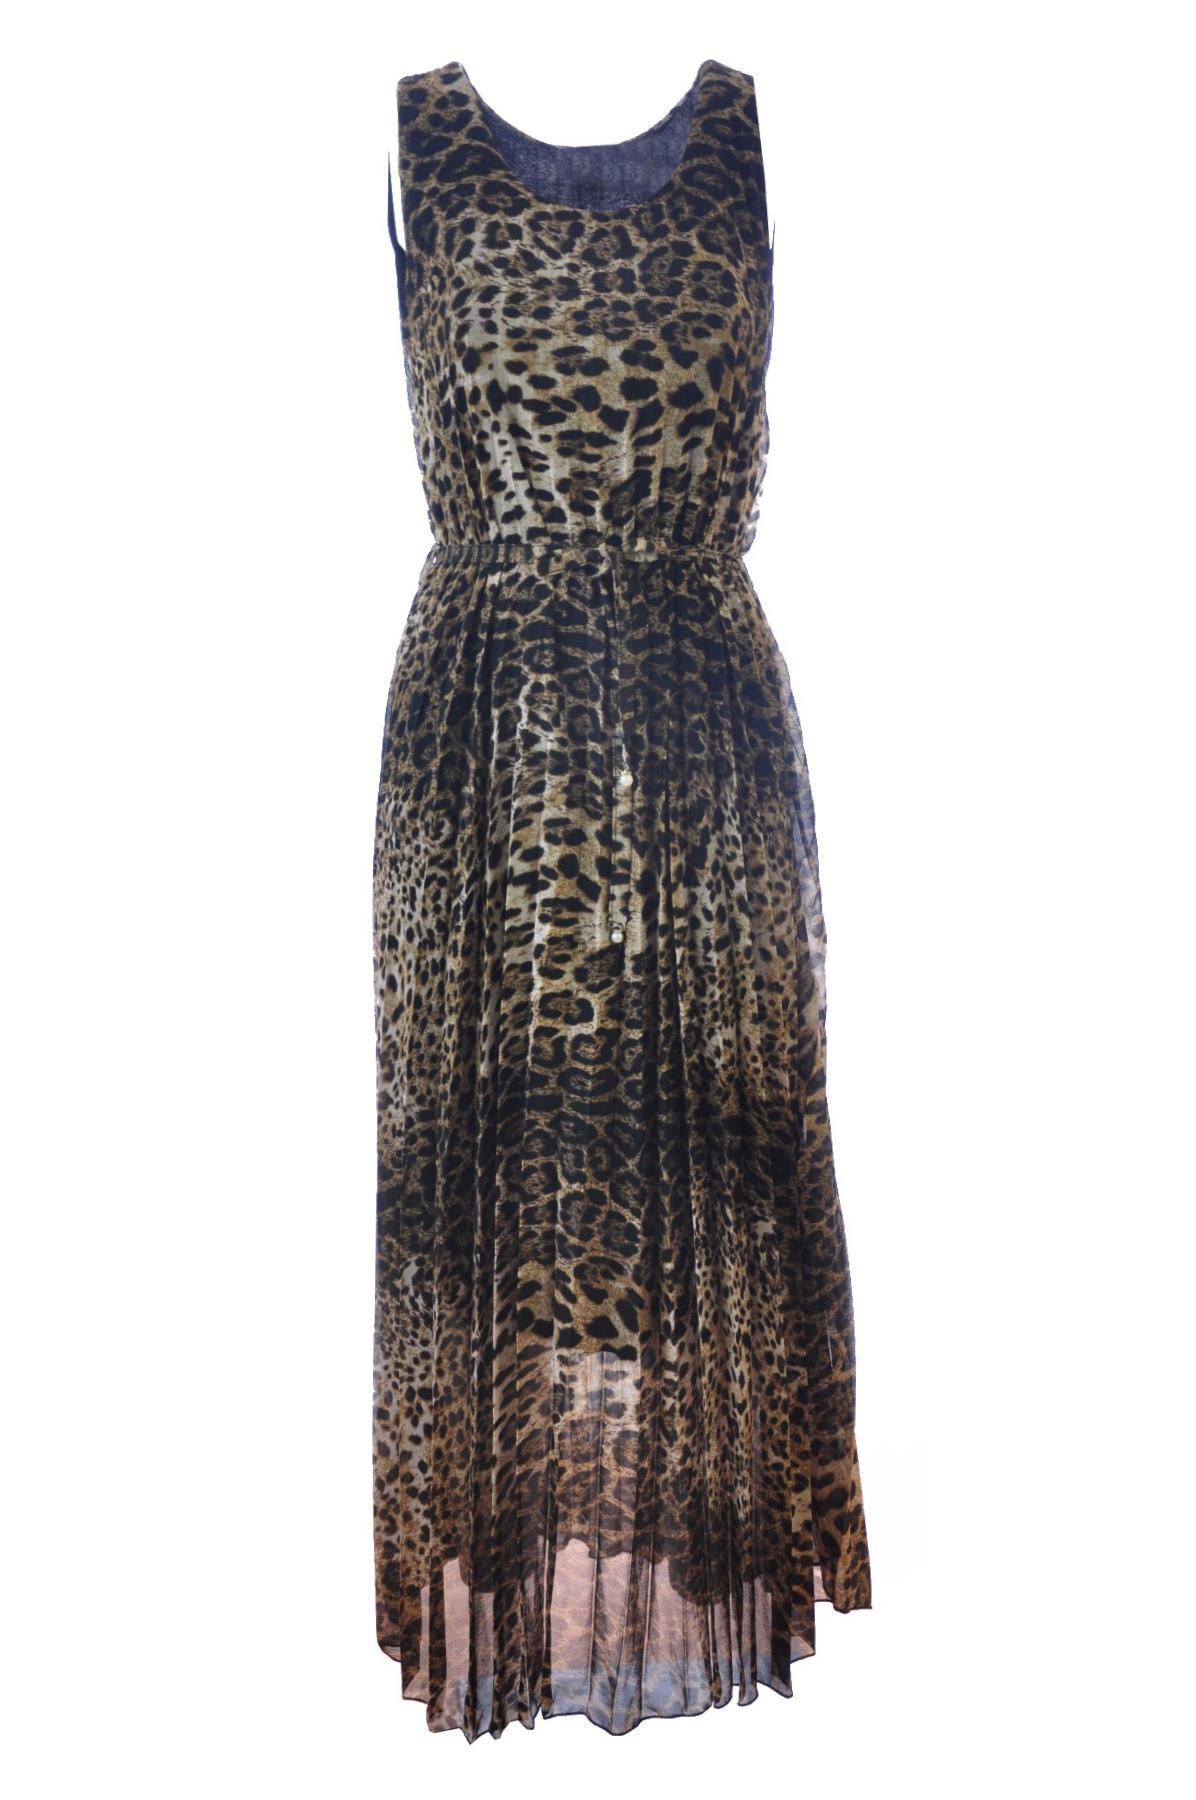 3d6485a8ee11d2 Maxi-jurk mouwloos plissé leopard Bruin Terra Di Siena ...